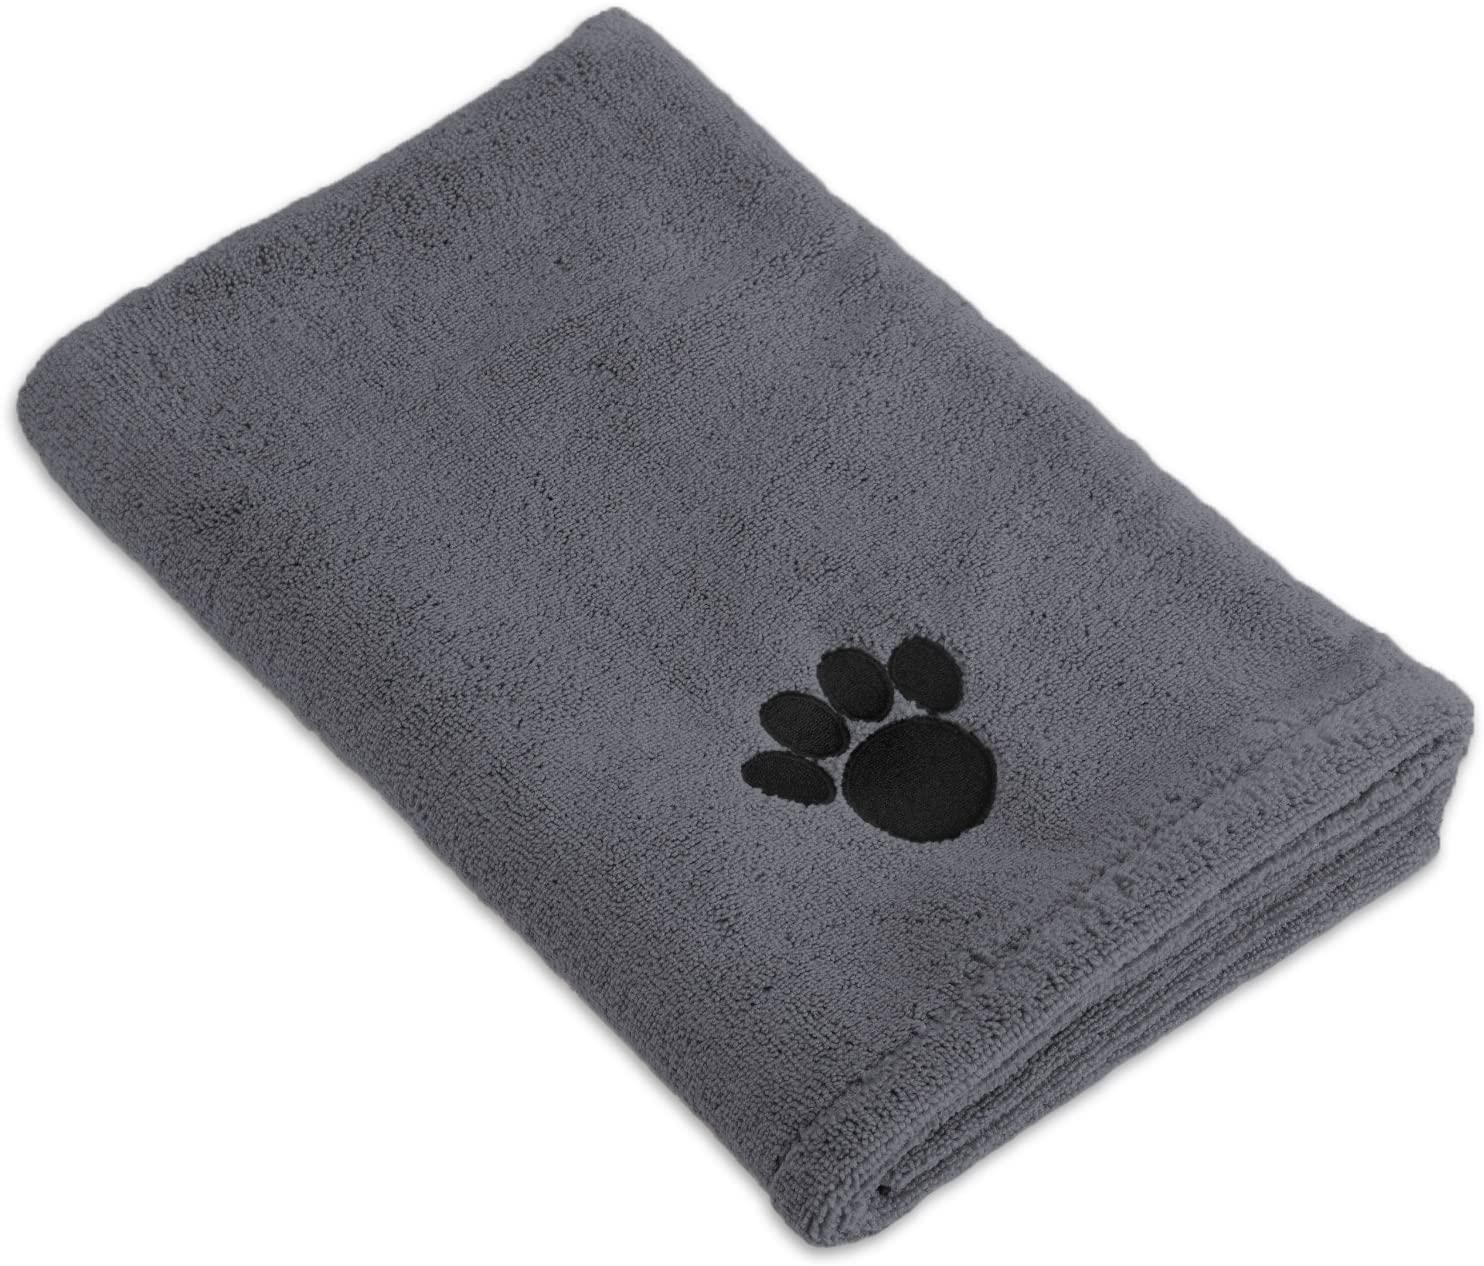 Bone Dry DII Microfiber Dog Bath Towel with Embroidered Paw